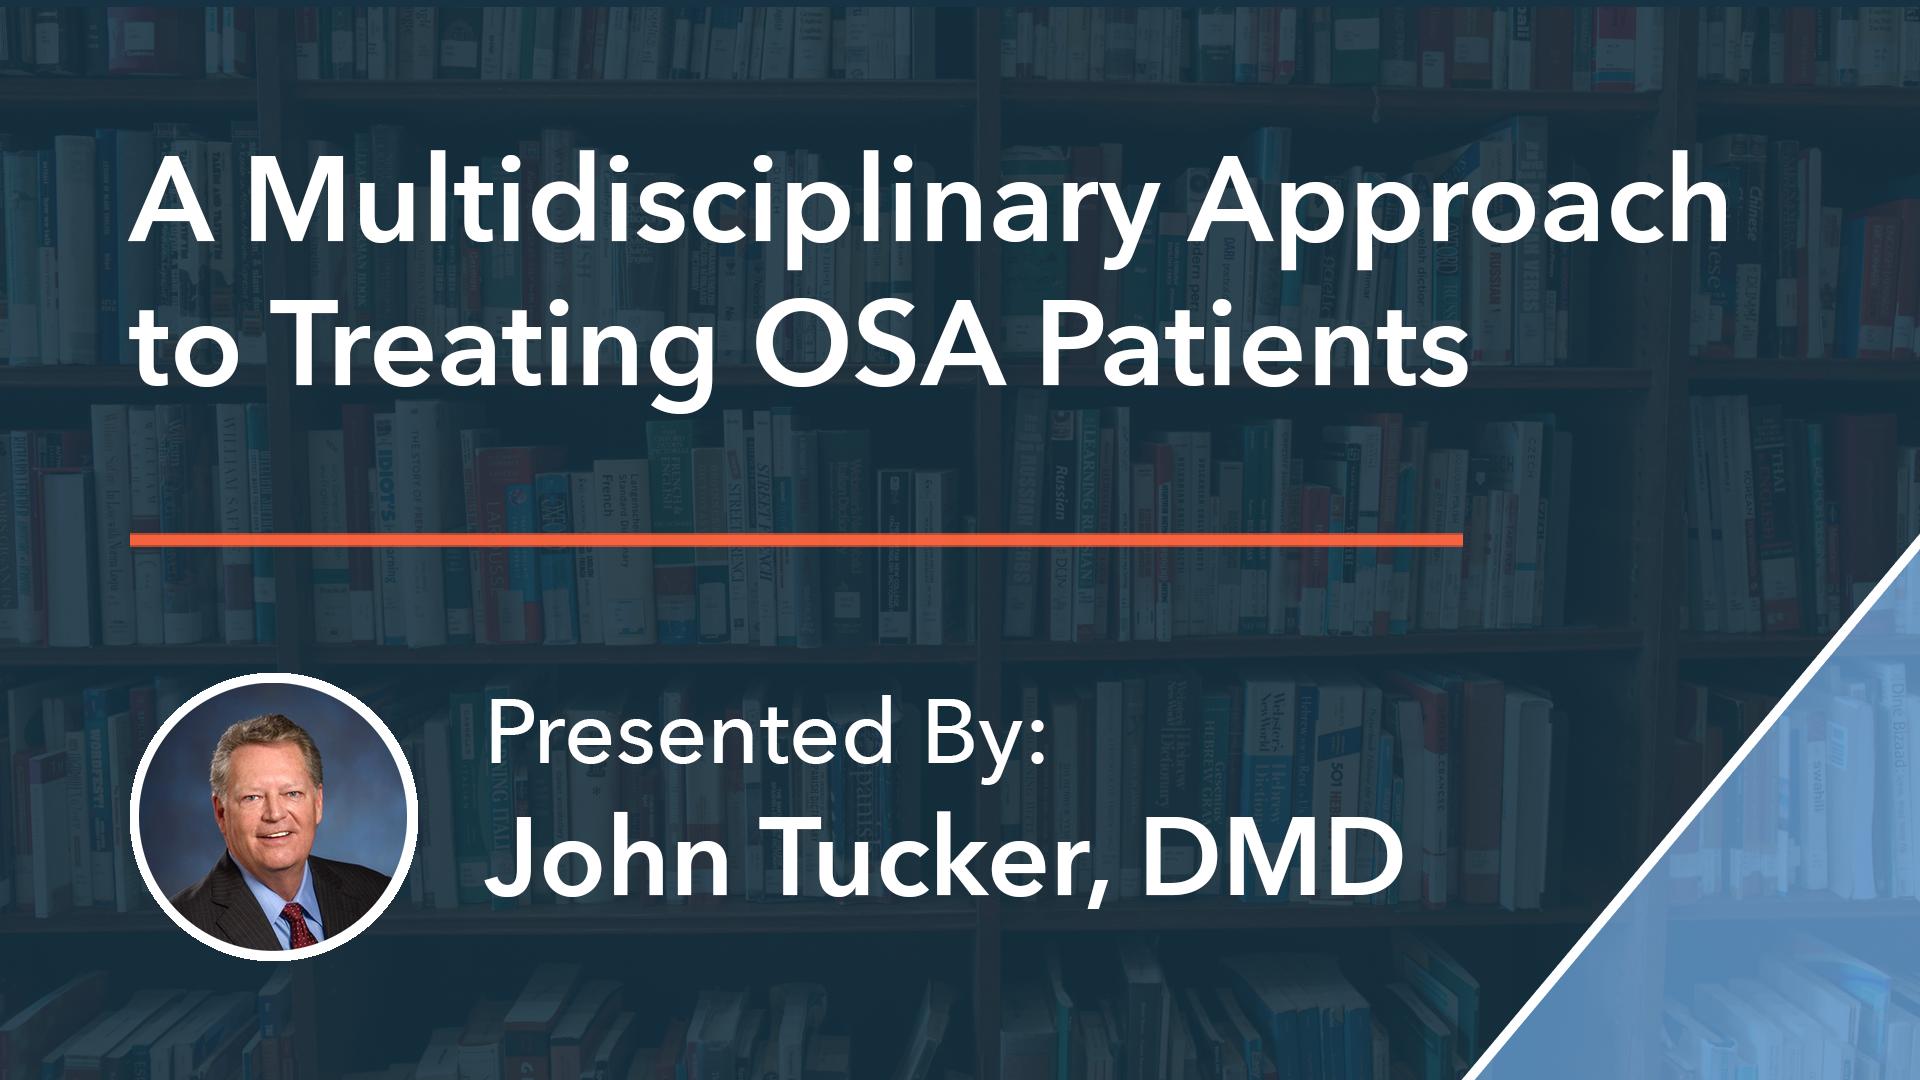 A Multidisciplinary Approach to Treating OSA Patients Dr John Tucker